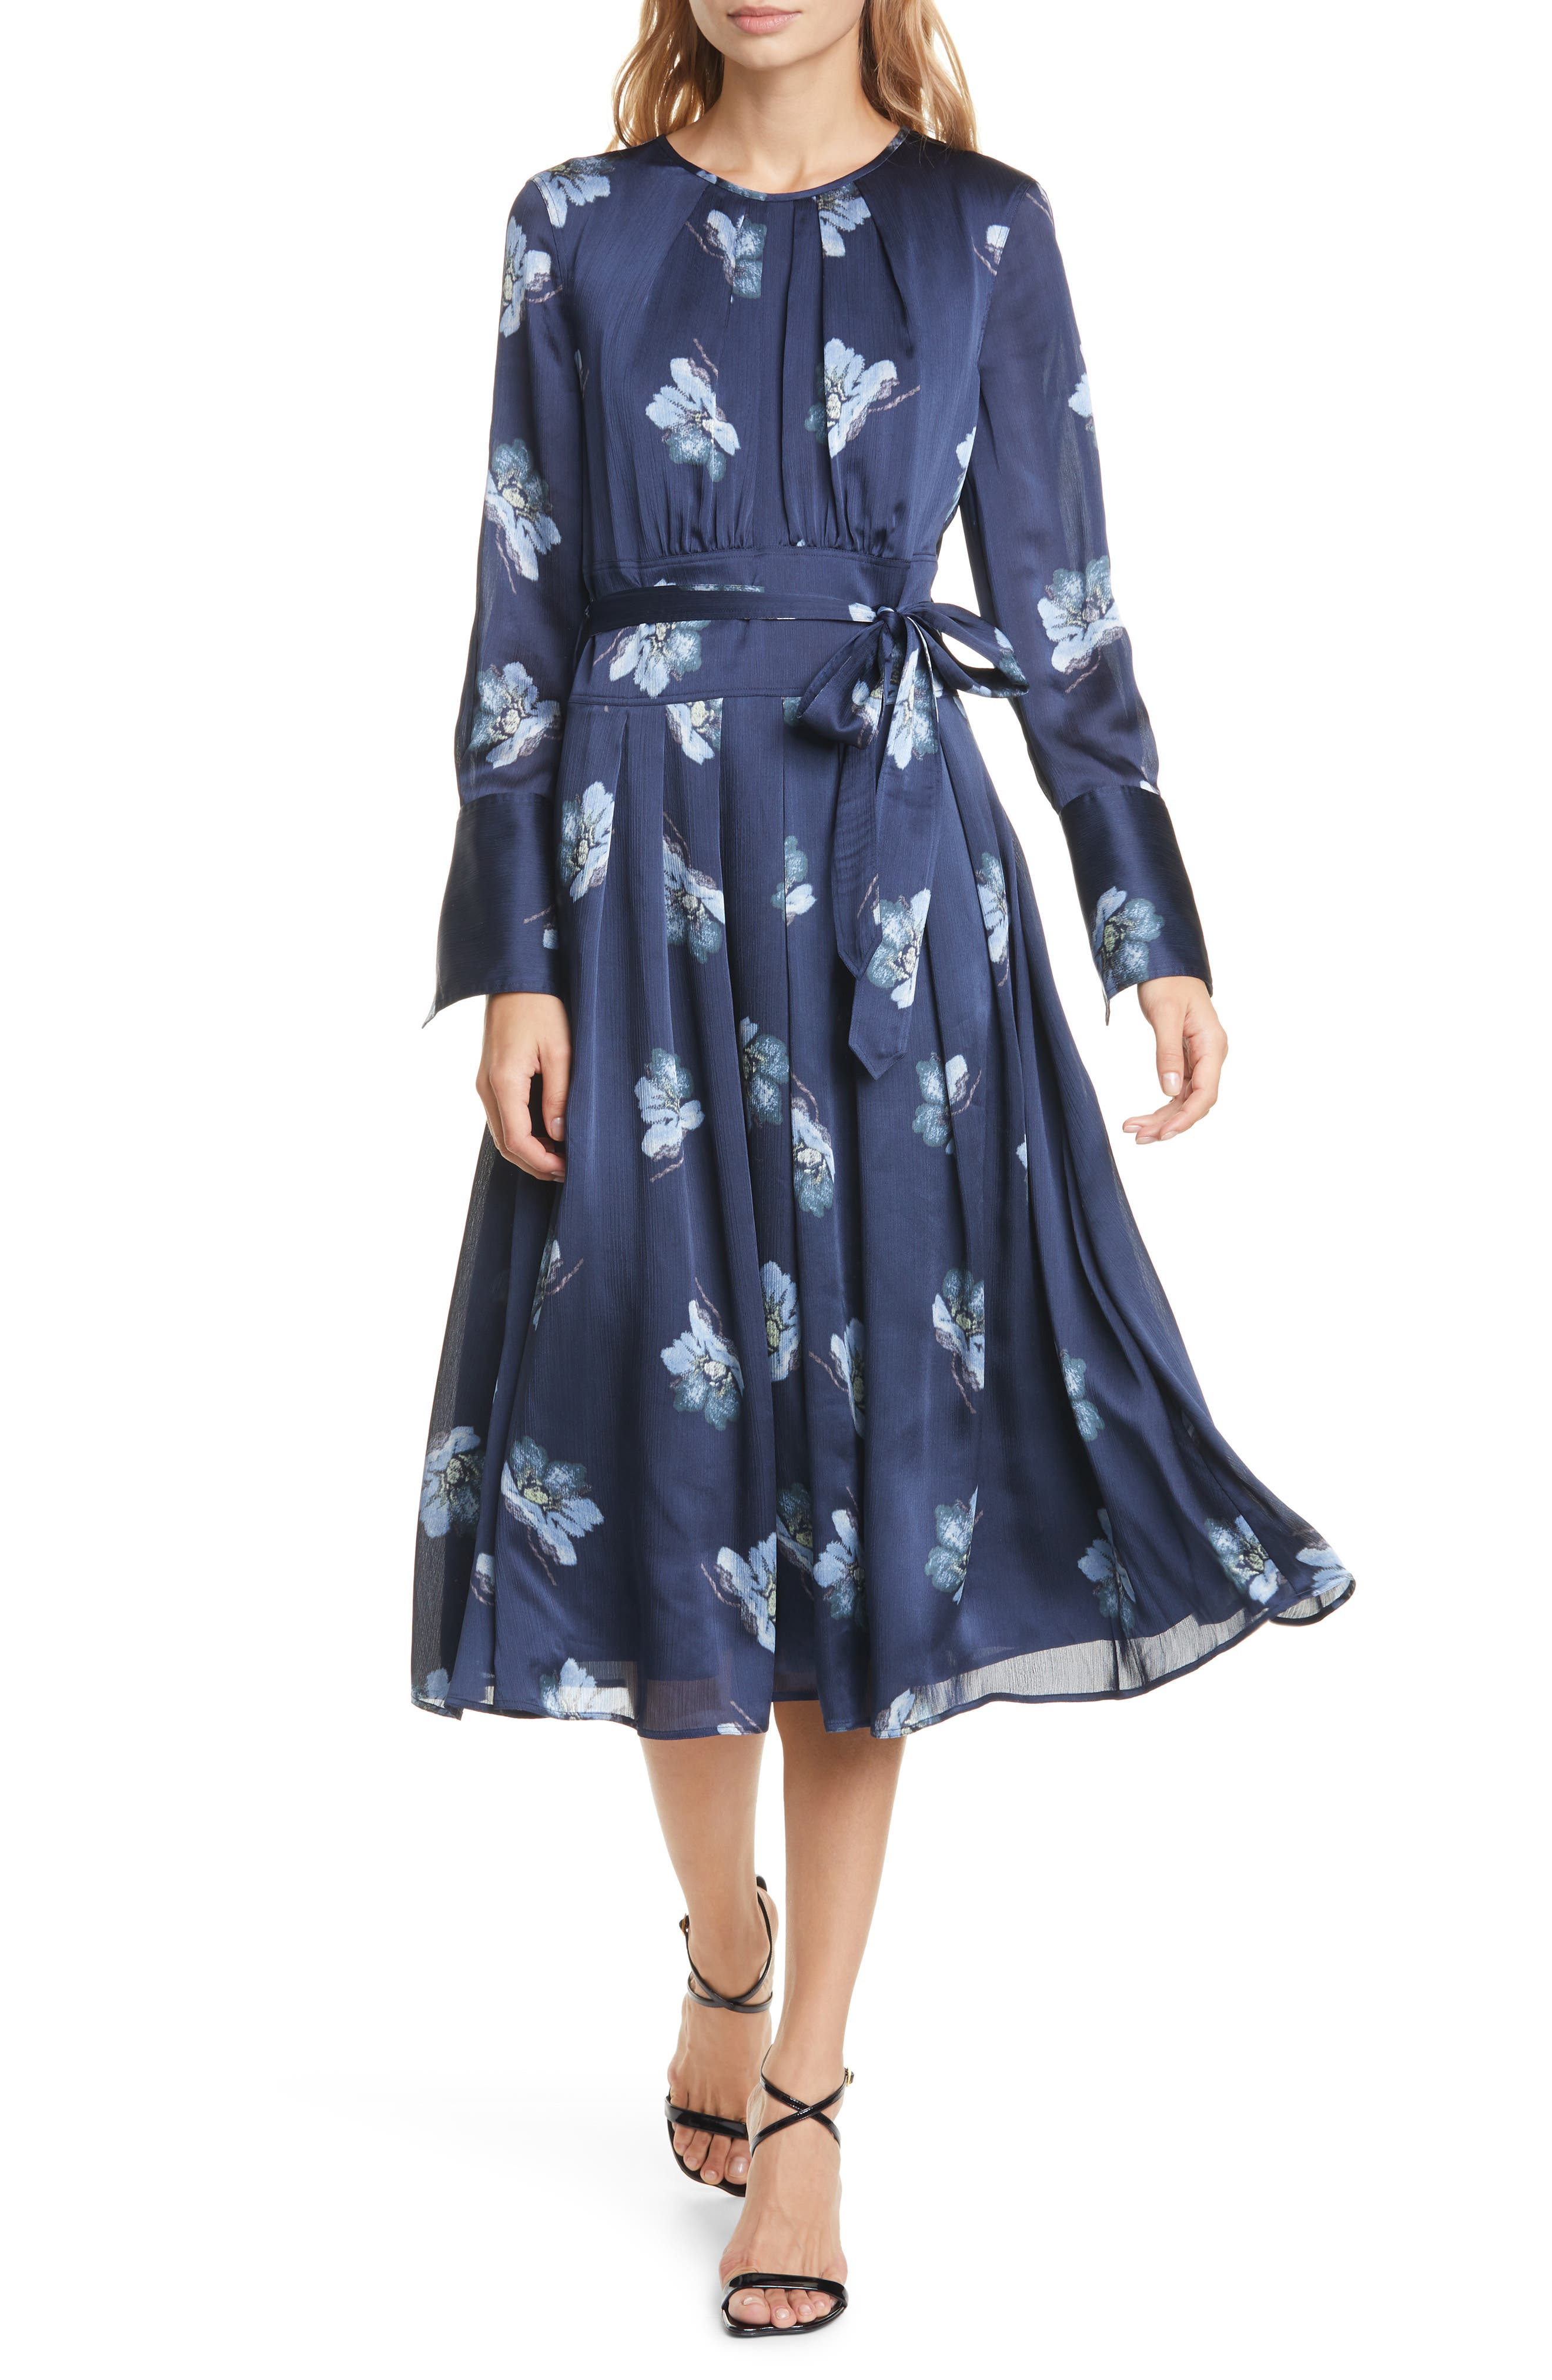 Club Monaco Dresses Floral Belted Long Sleeve Midi Dress